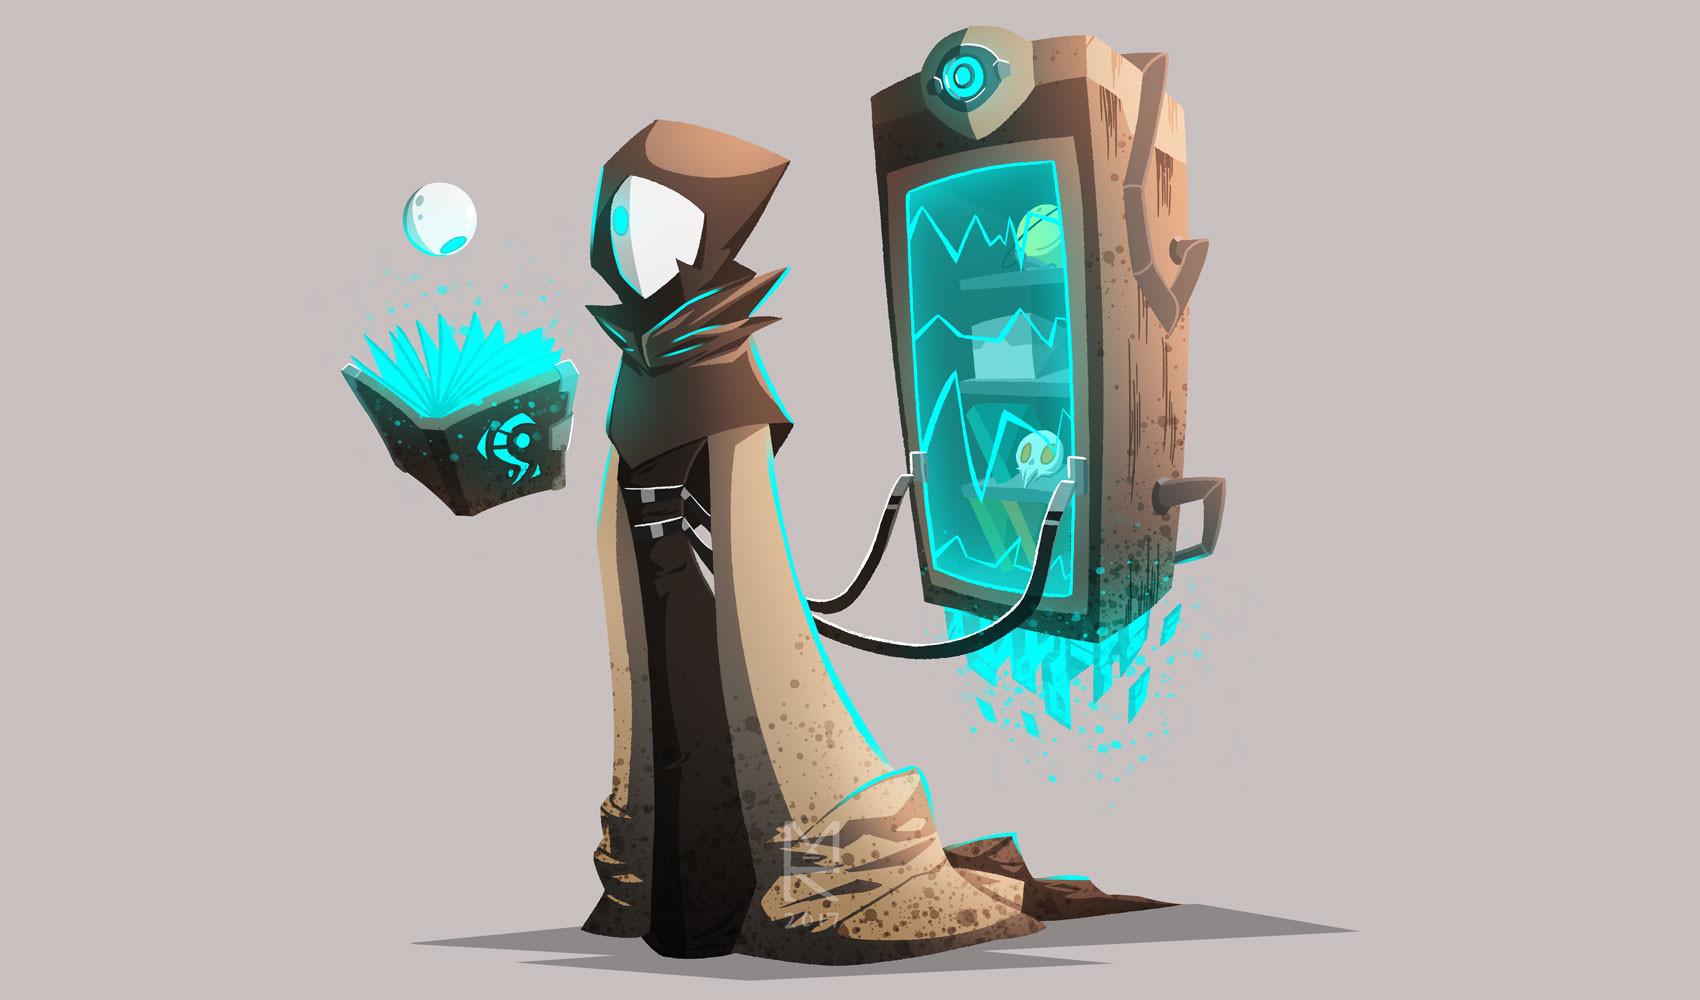 artstation character design merchant minh kieu